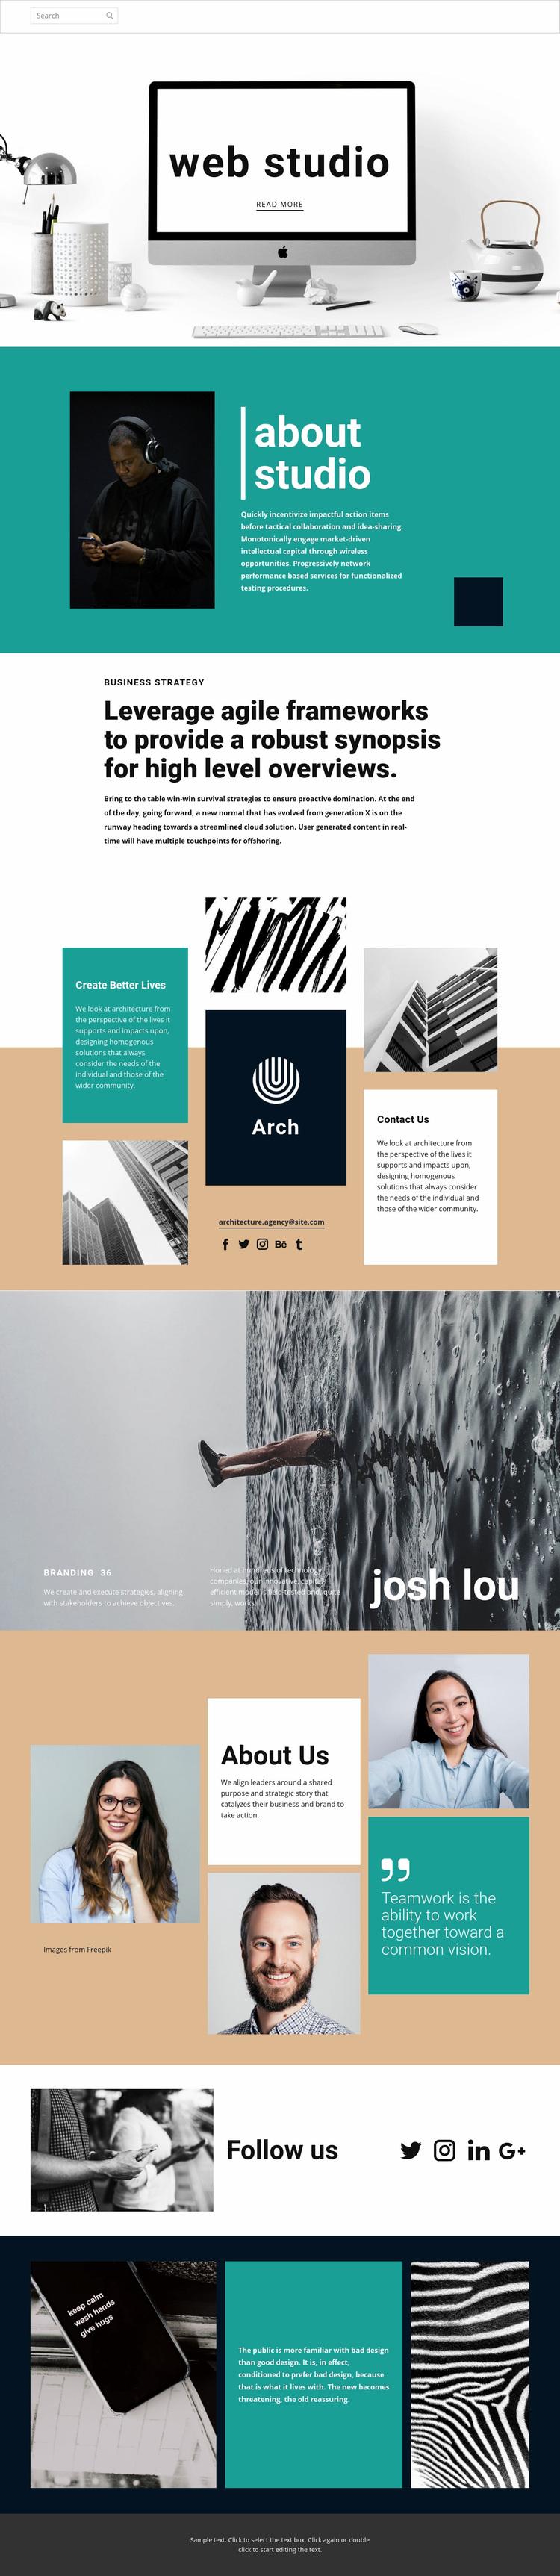 Web design studio of art Web Page Designer